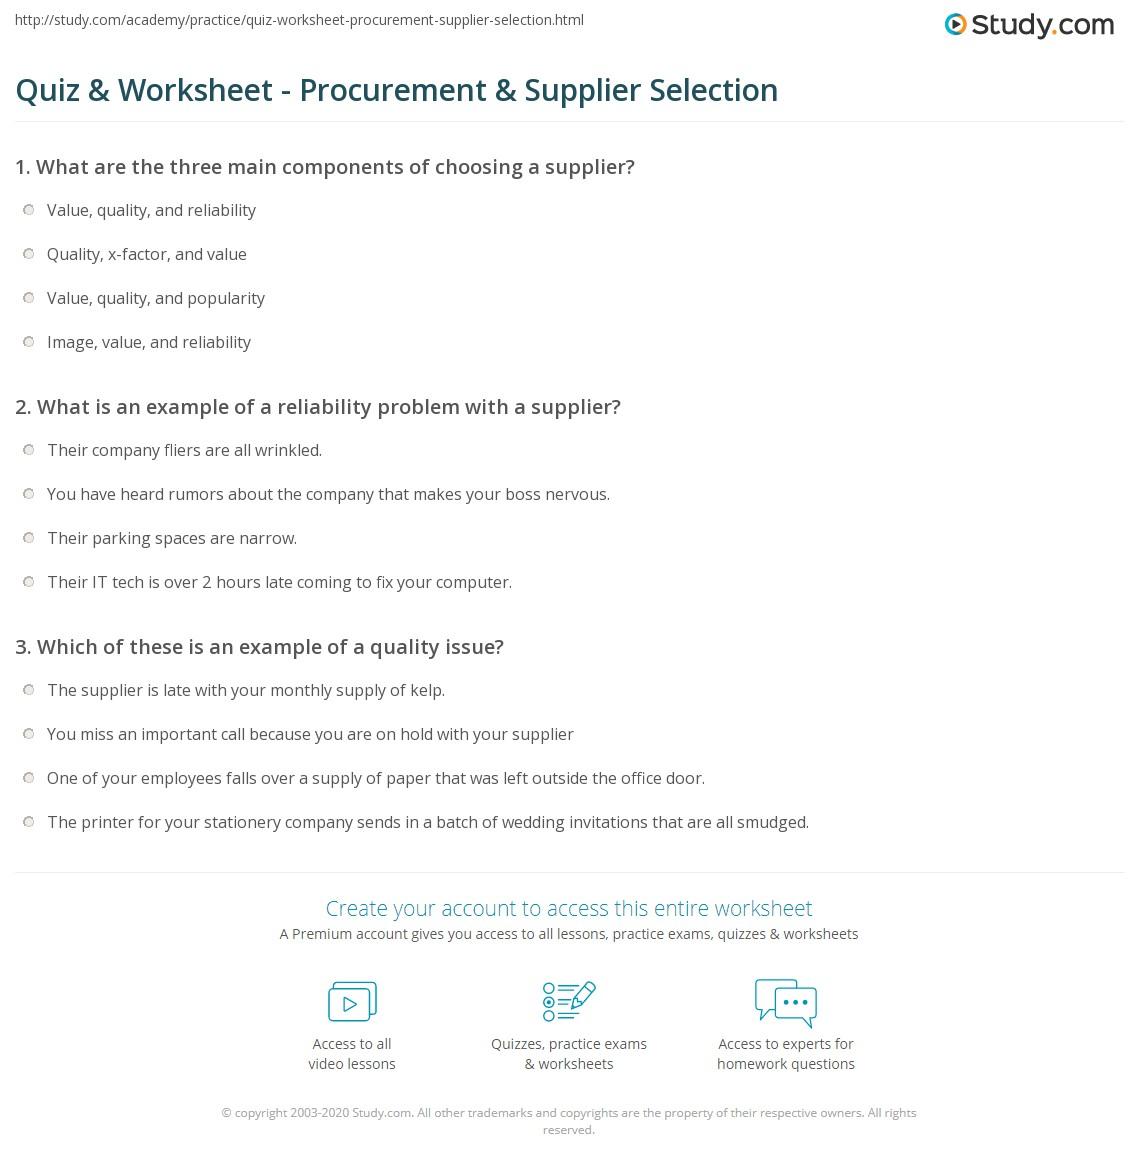 Quiz & Worksheet - Procurement & Supplier Selection | Study com